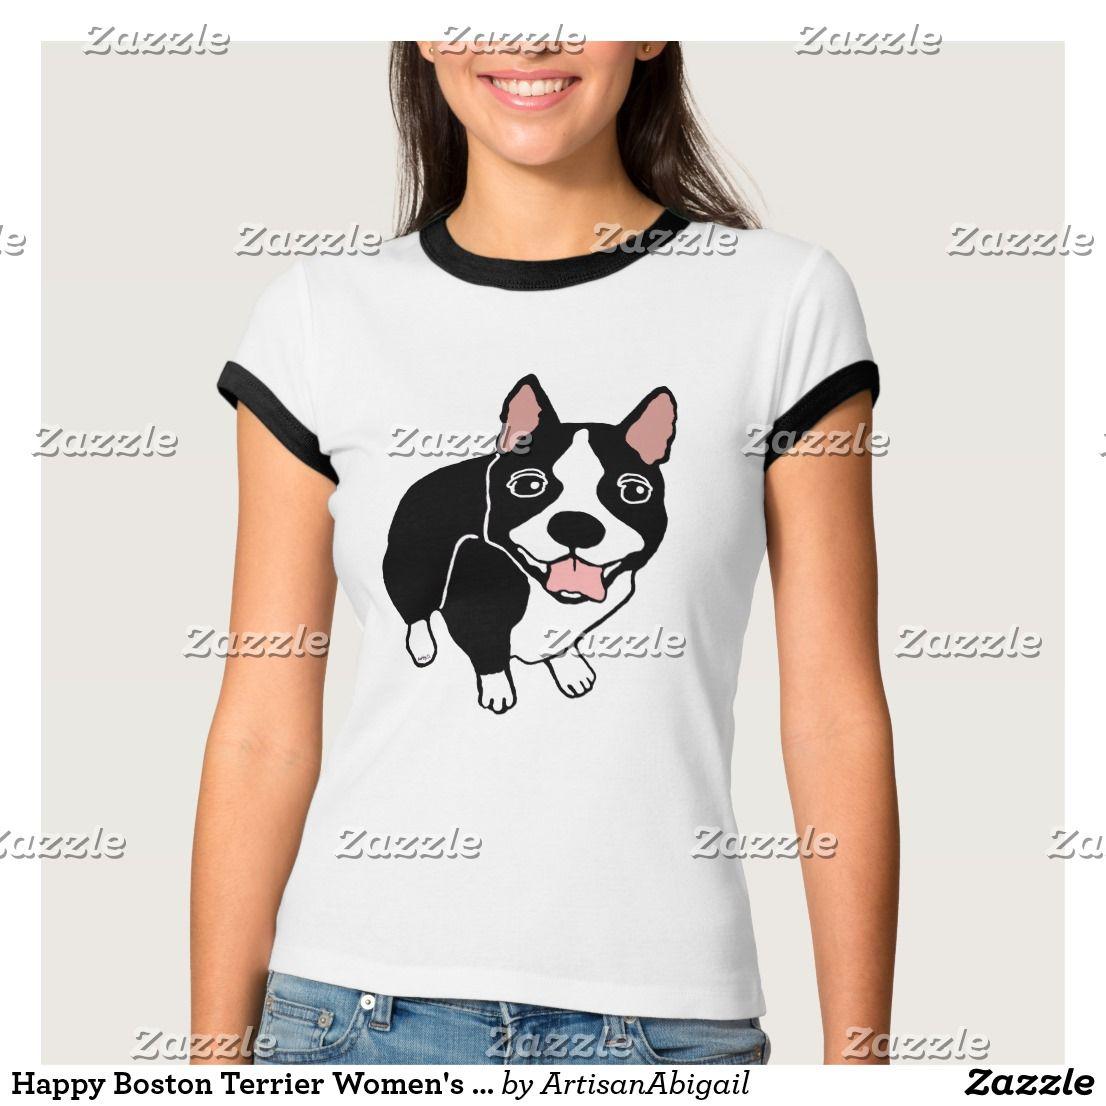 Happy Boston Terrier Women S Bella Ringer T Shirt Artisanabigail At Zazzle Ringer Womenstshirt Bostonterrier T Shirts For Women Women Clothes Design